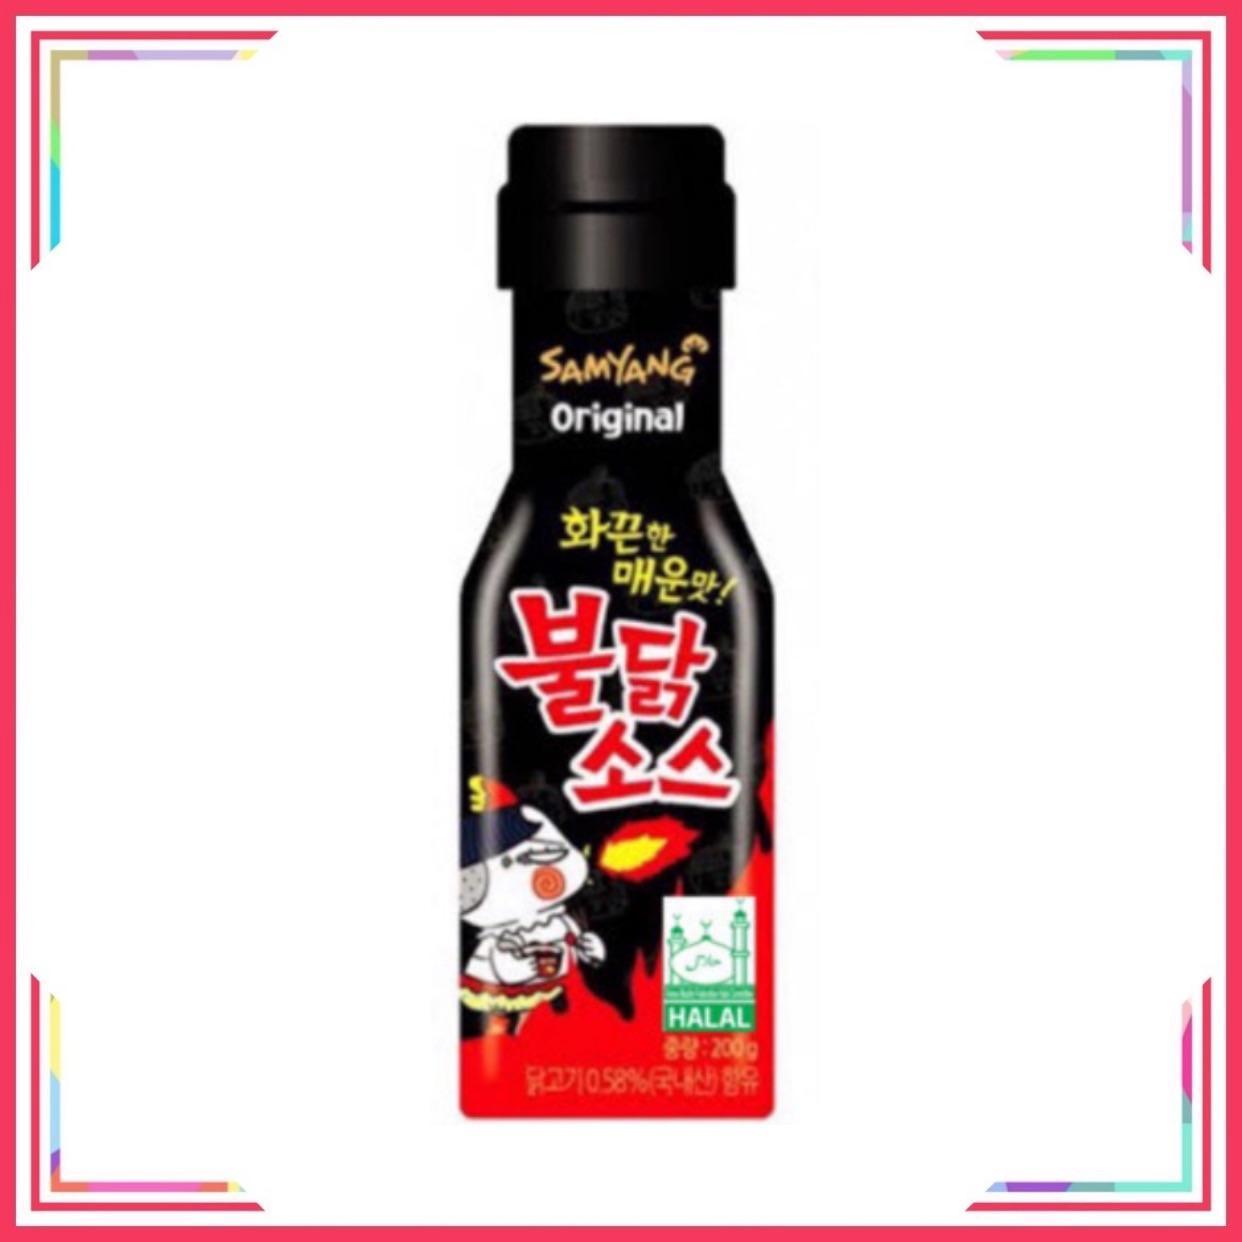 Samyang HC Liquid Sauce Bottle [ORIGINAL] 200gr